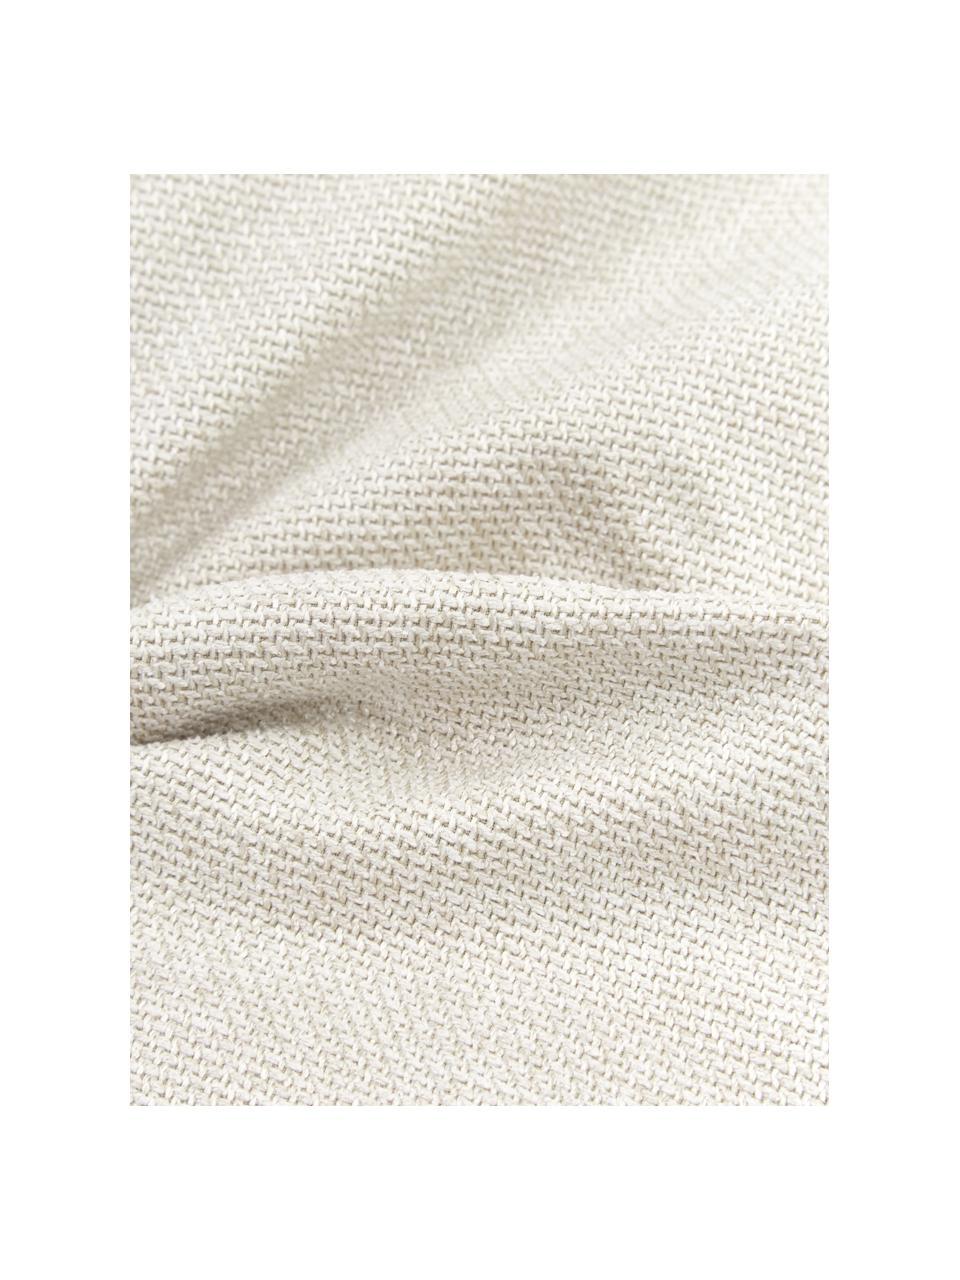 Sofa-Kissen Lennon in Beige, Bezug: 100% Polyester, Webstoff Beige, 60 x 60 cm